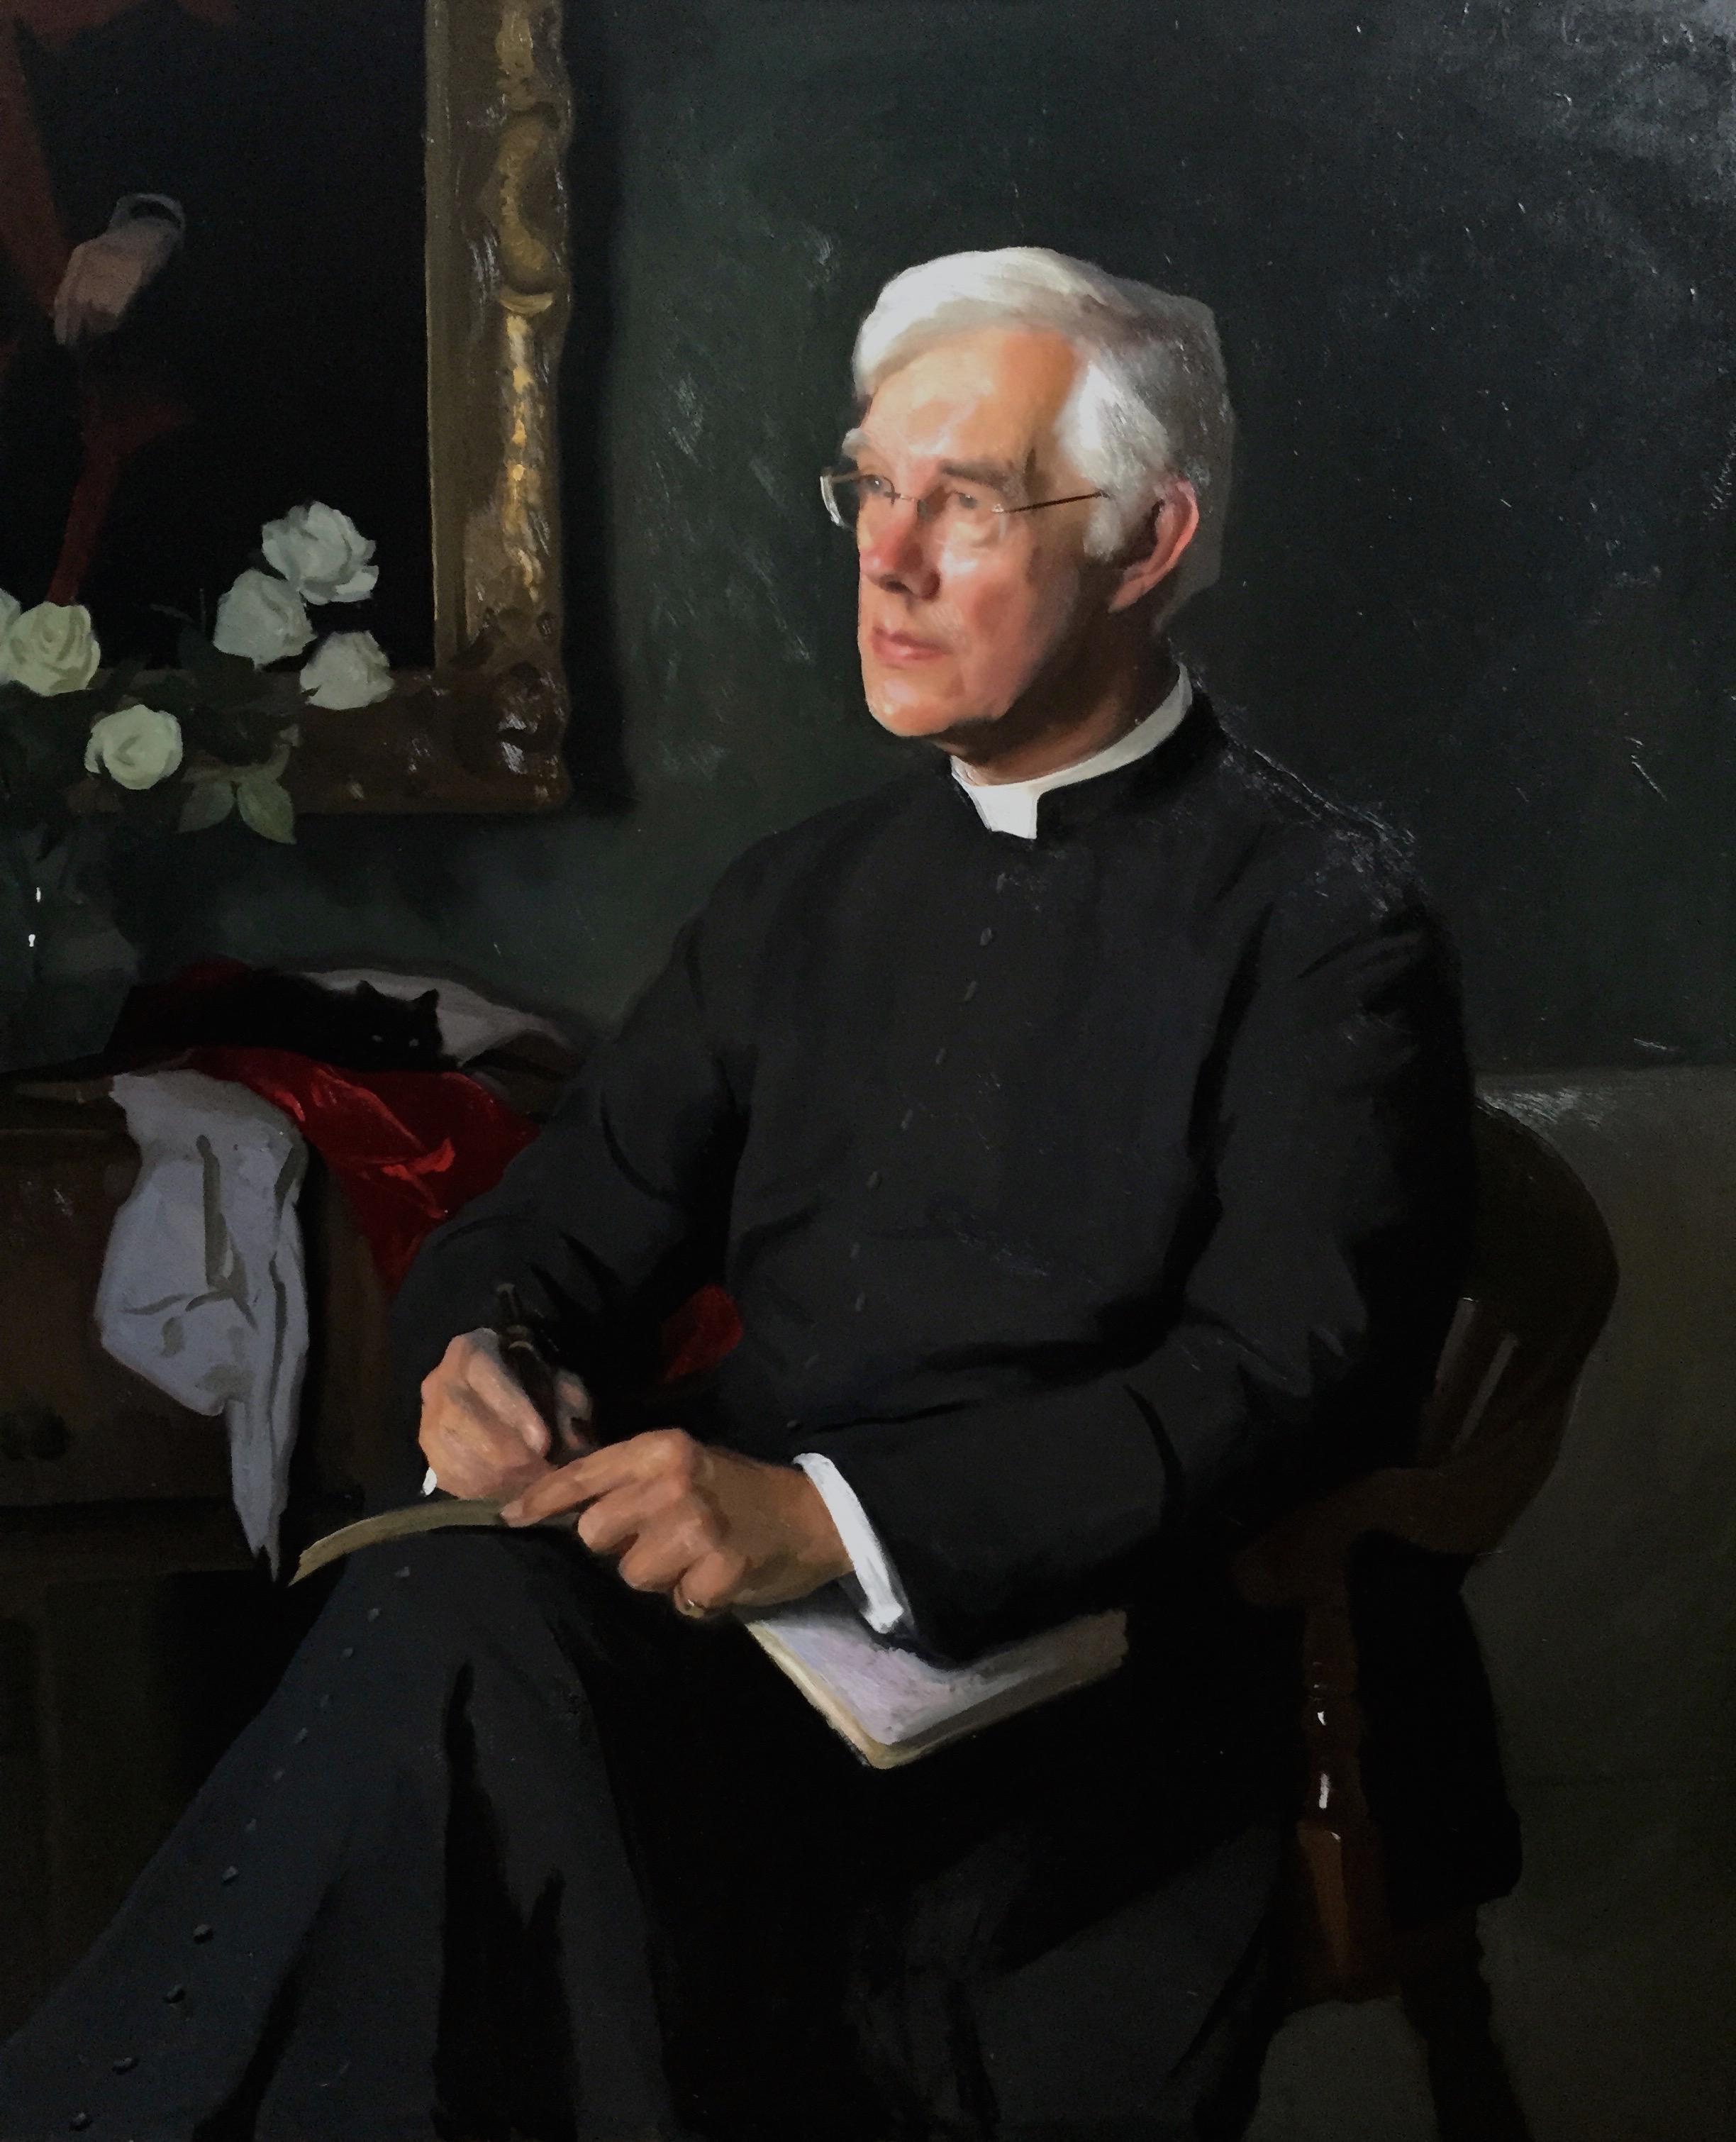 The Dean of Canterbury, Robert Willis